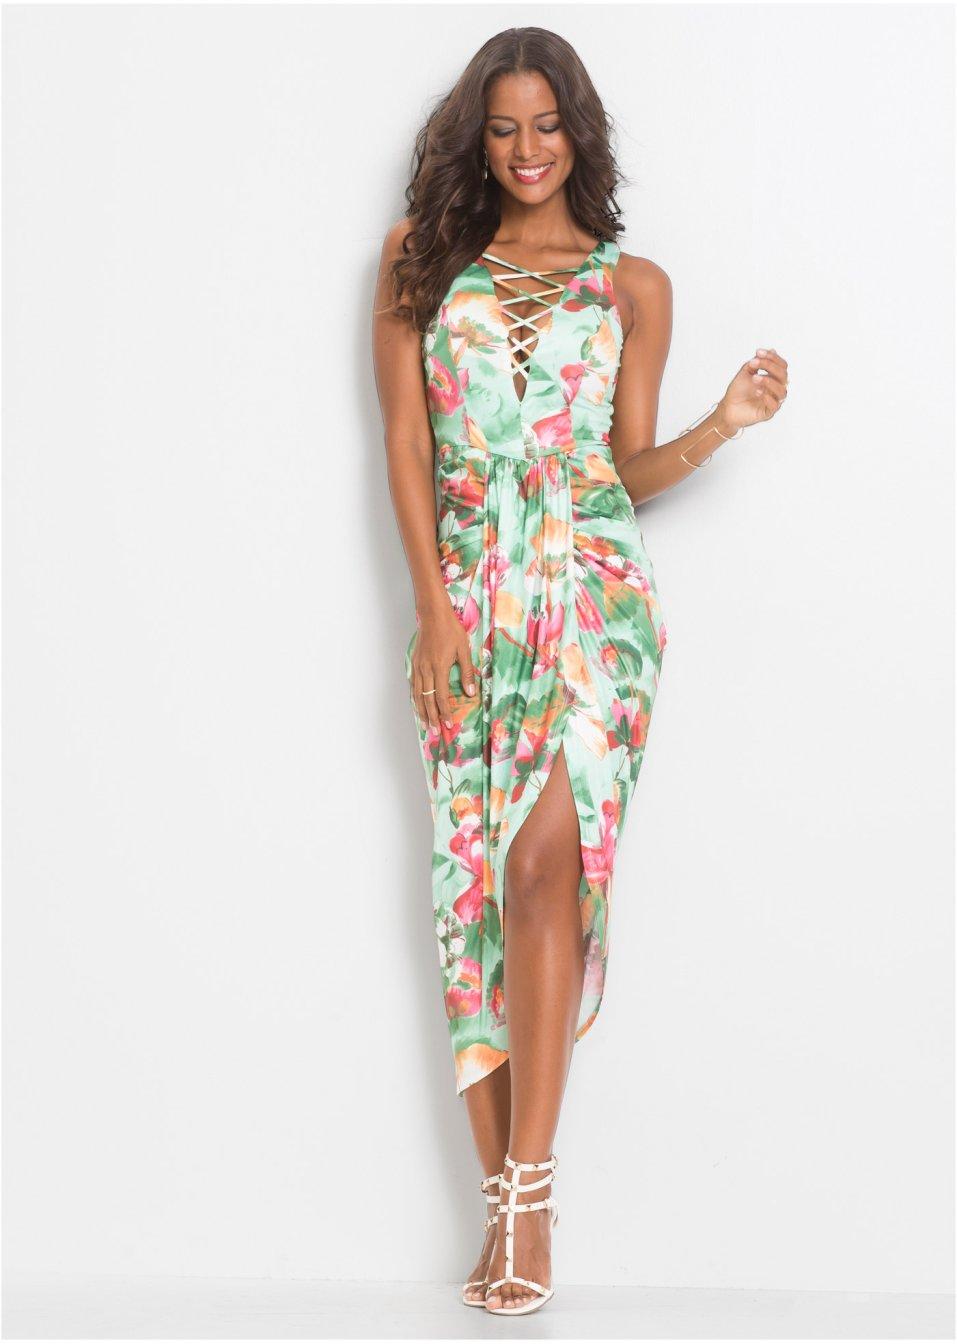 a2cfaa046fb6 Blommig klänning ljusgrön/ljusorange/pink - Dam - bonprix.se